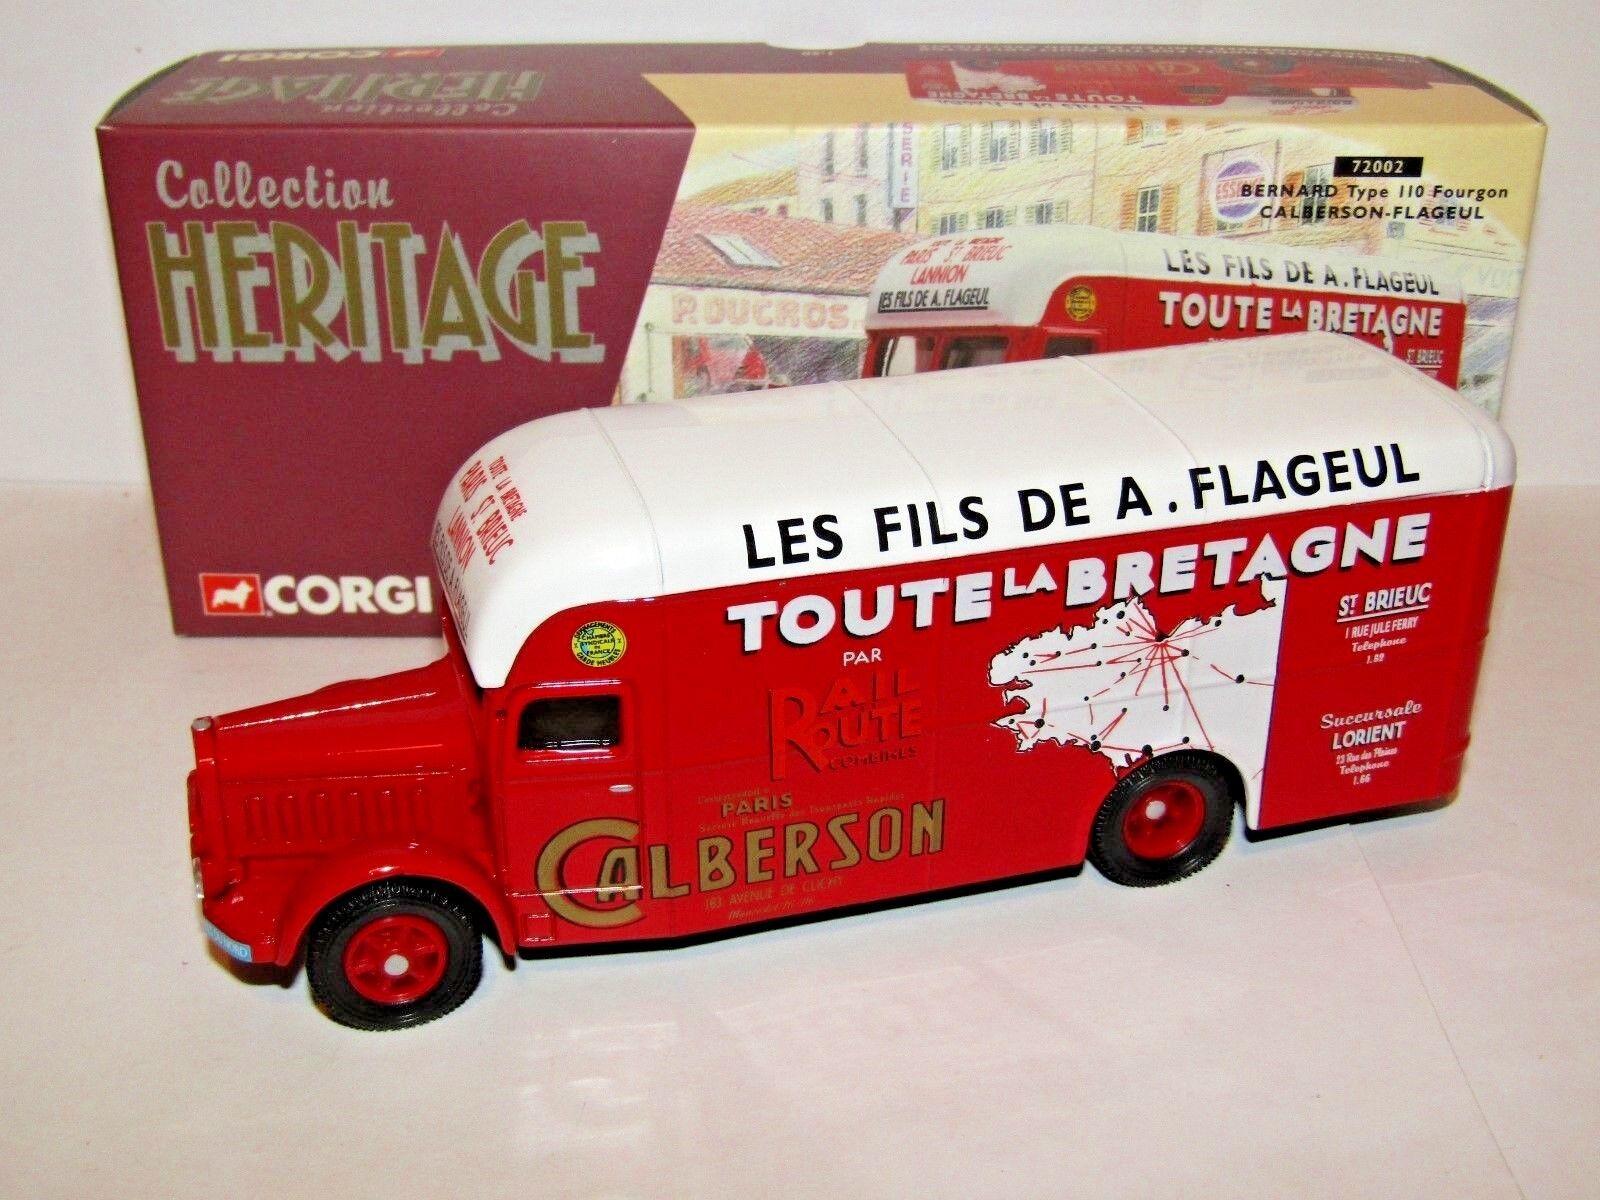 CORGI BERNARD TYPE 110 FOURGON CALBERSON-FLAGUEL 1 50 72002